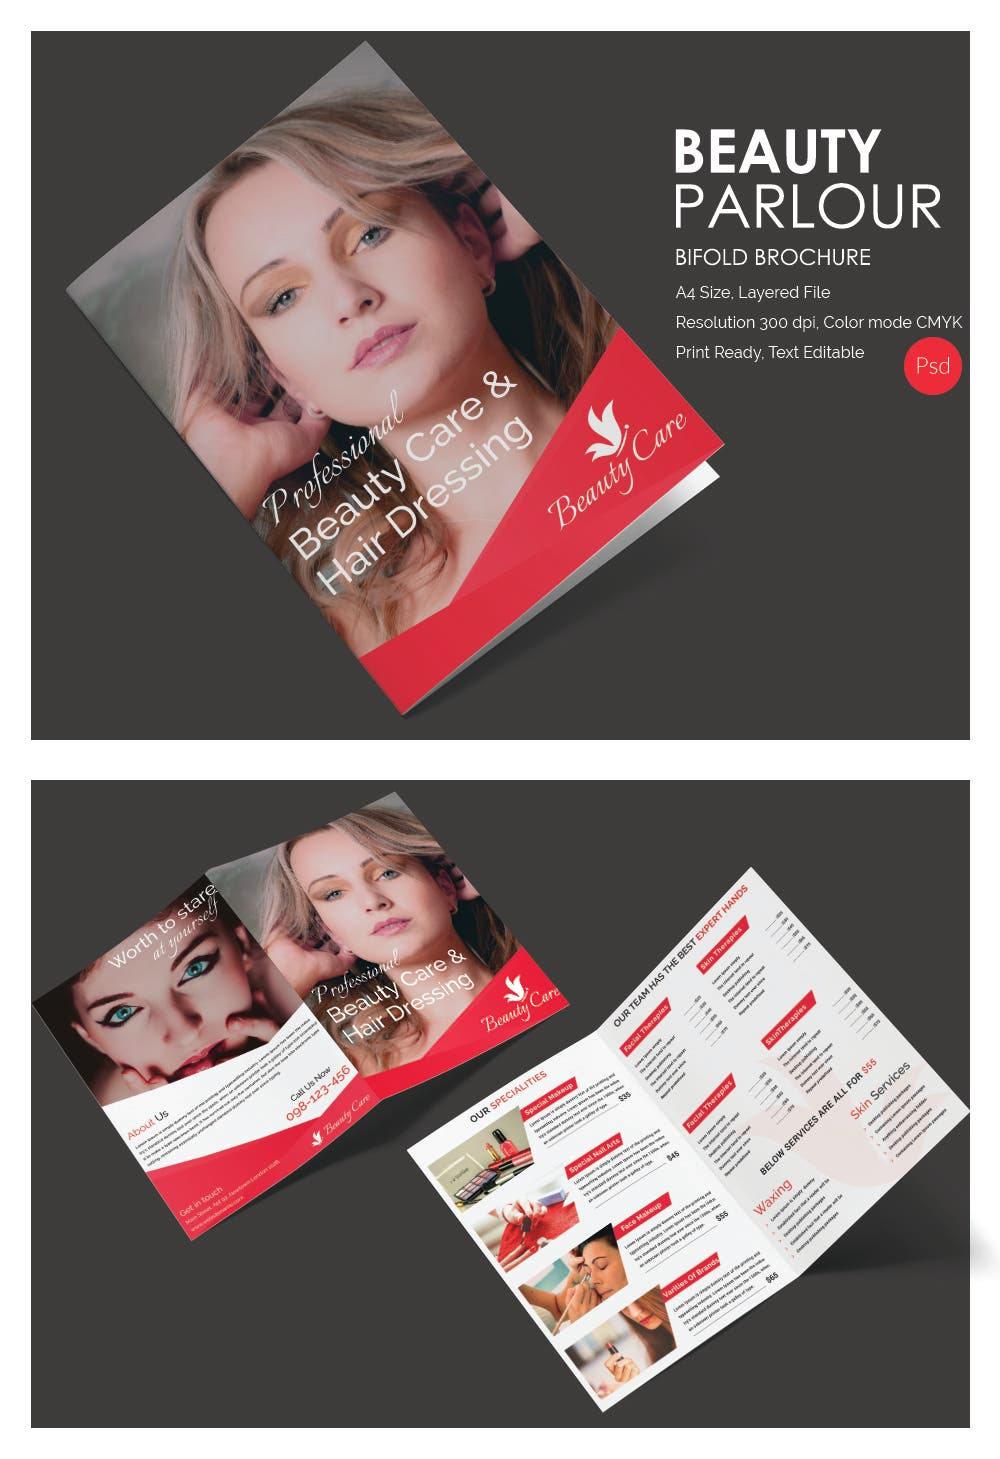 Beauty Parlour bifold brochure mockup